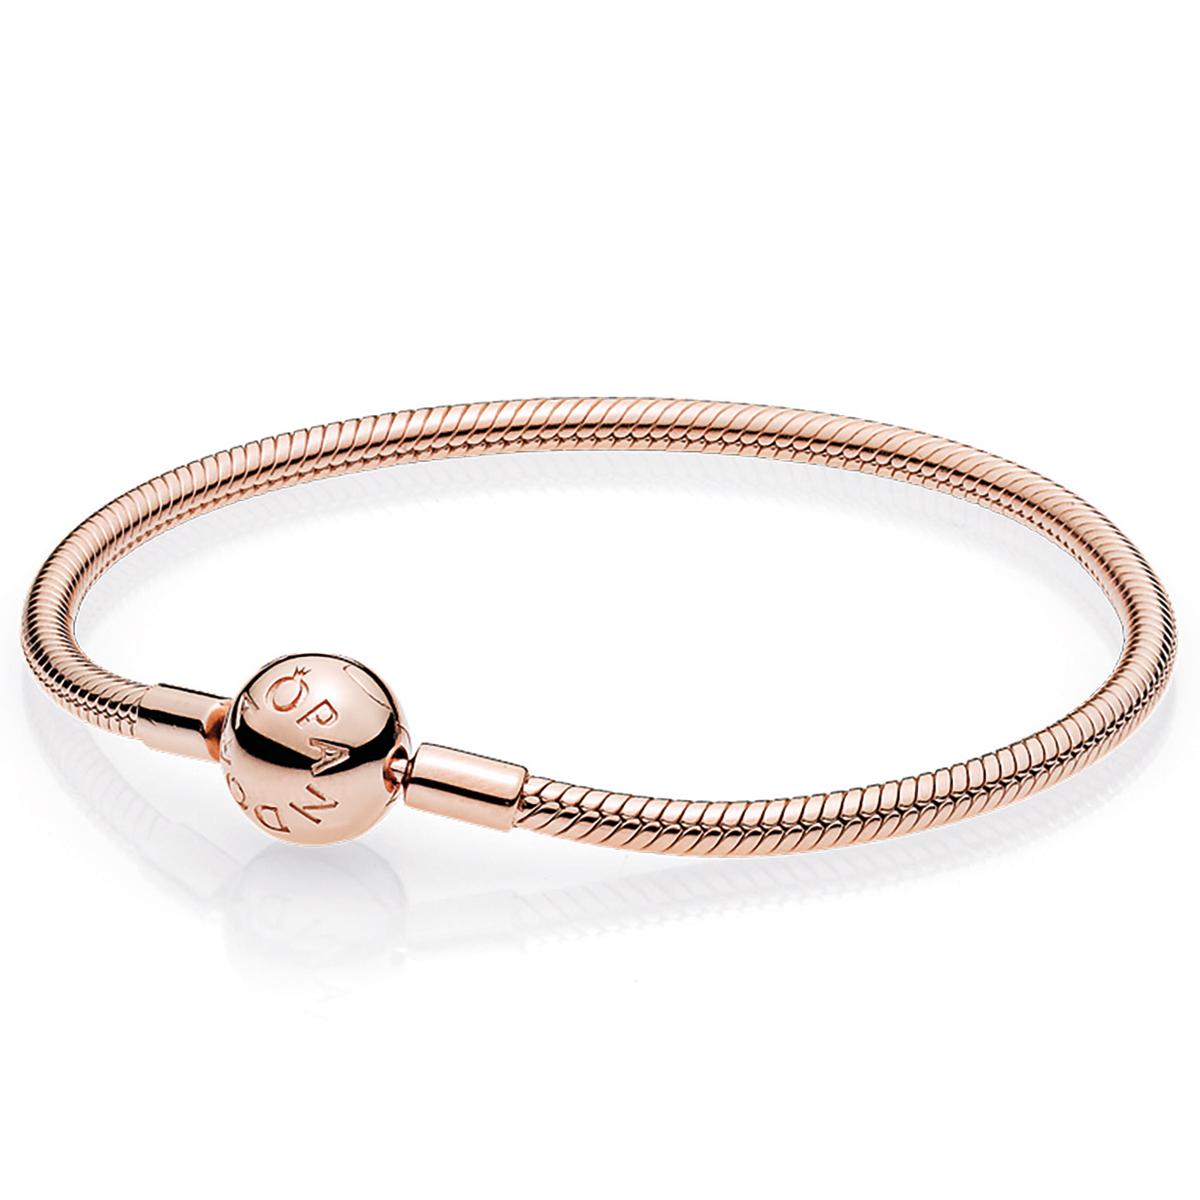 6997458a0 PANDORA Rose Gold Smooth Clasp Bracelet - Pancharmbracelets.com